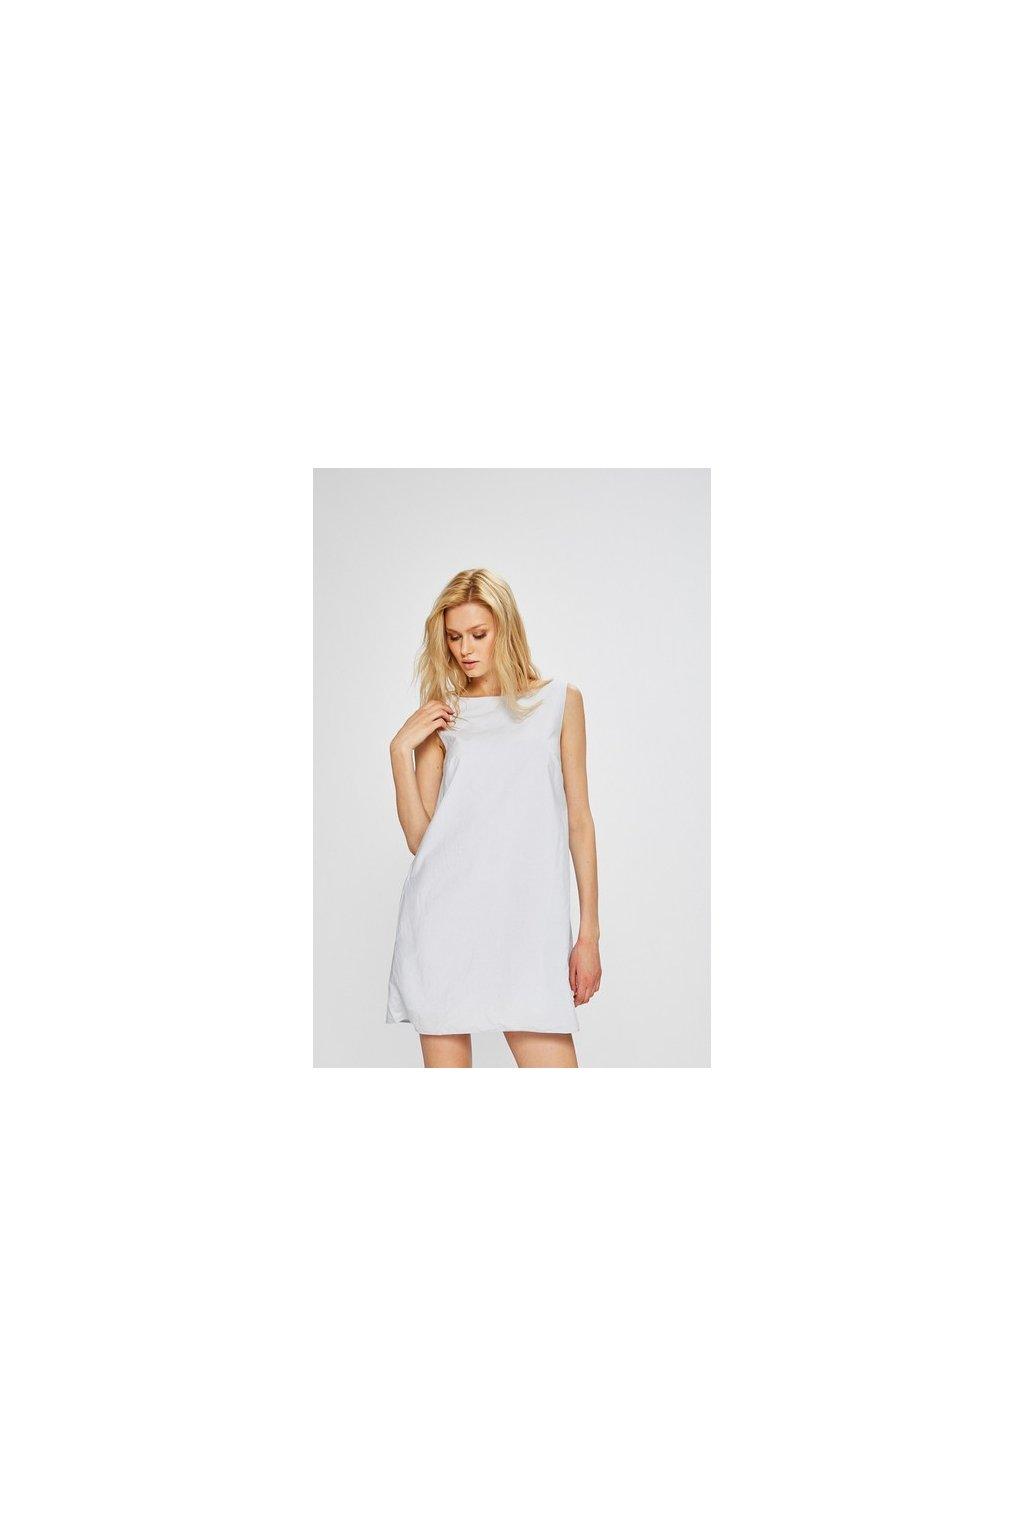 Dámské šaty Tommy Hilfiger DW0DW04488